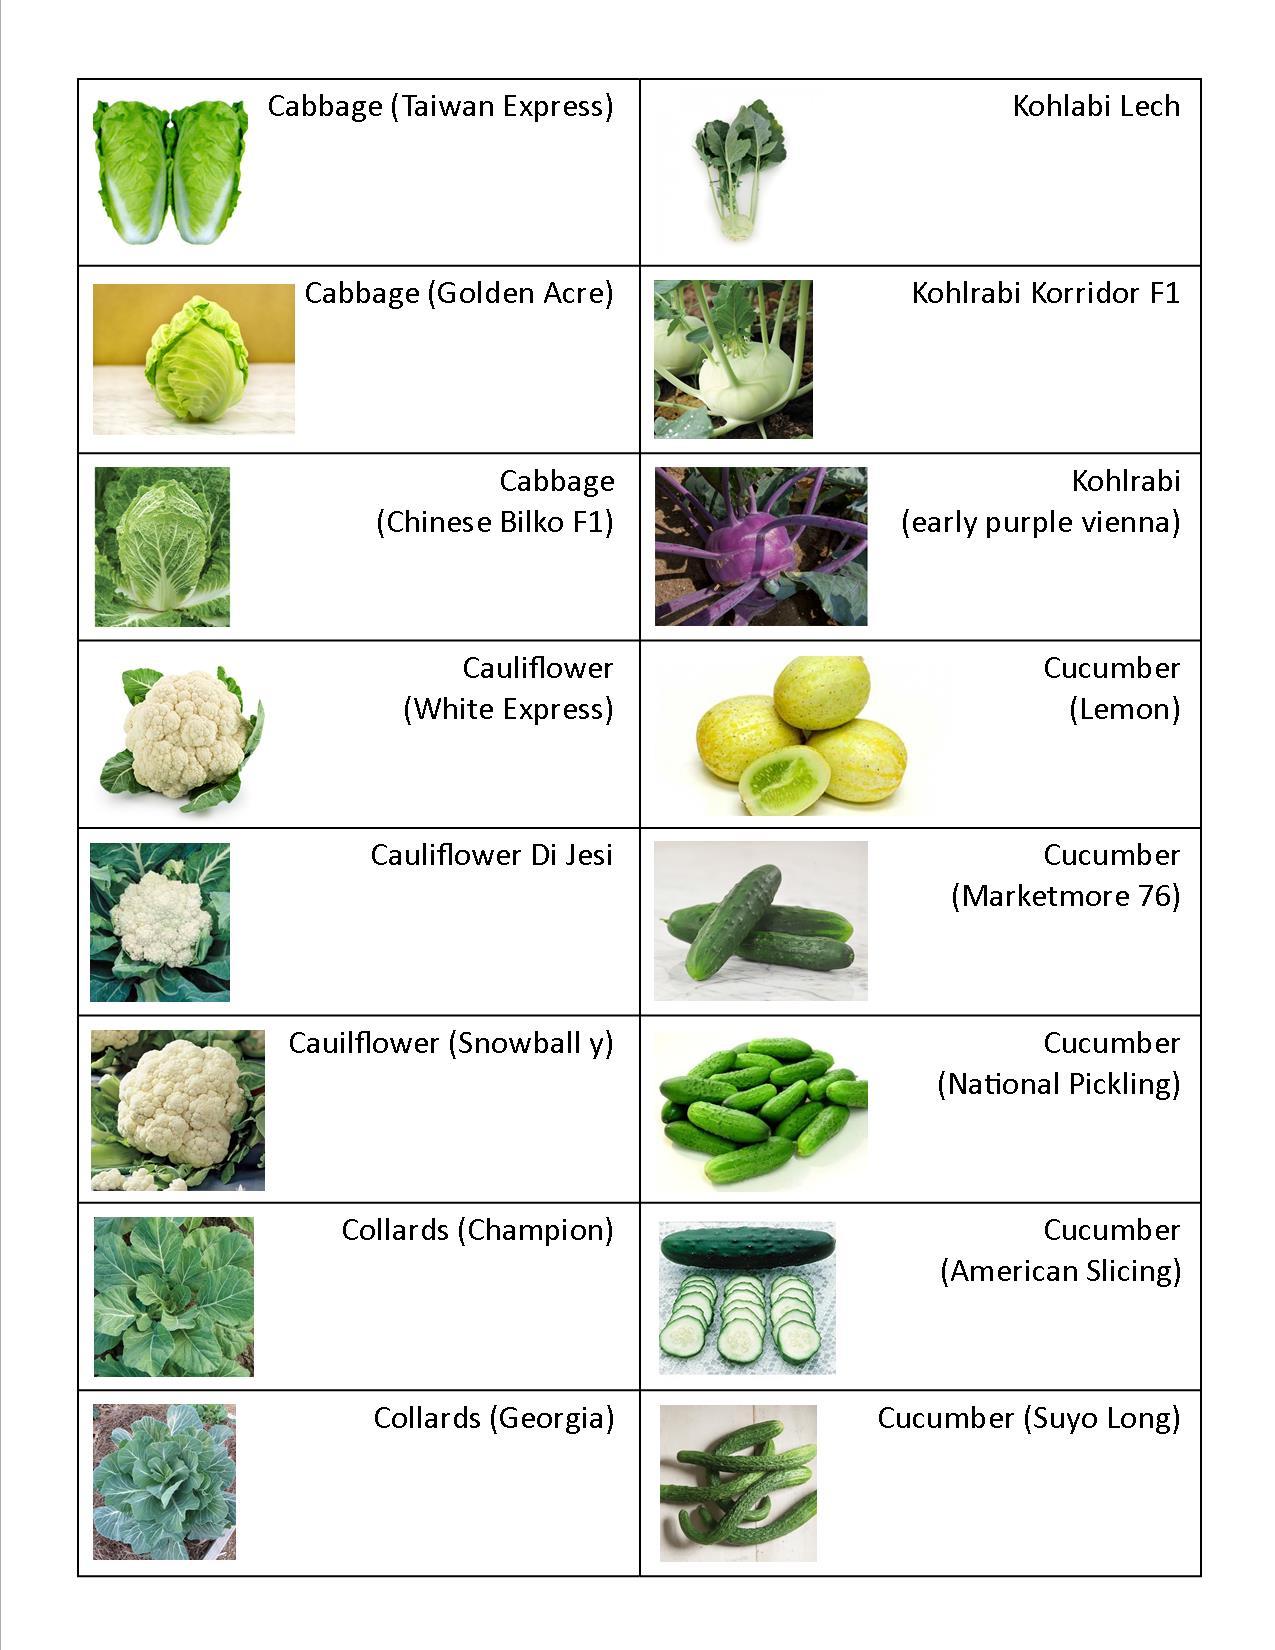 Kohlrabi, Cauliflower, Cucumber, Cabbage